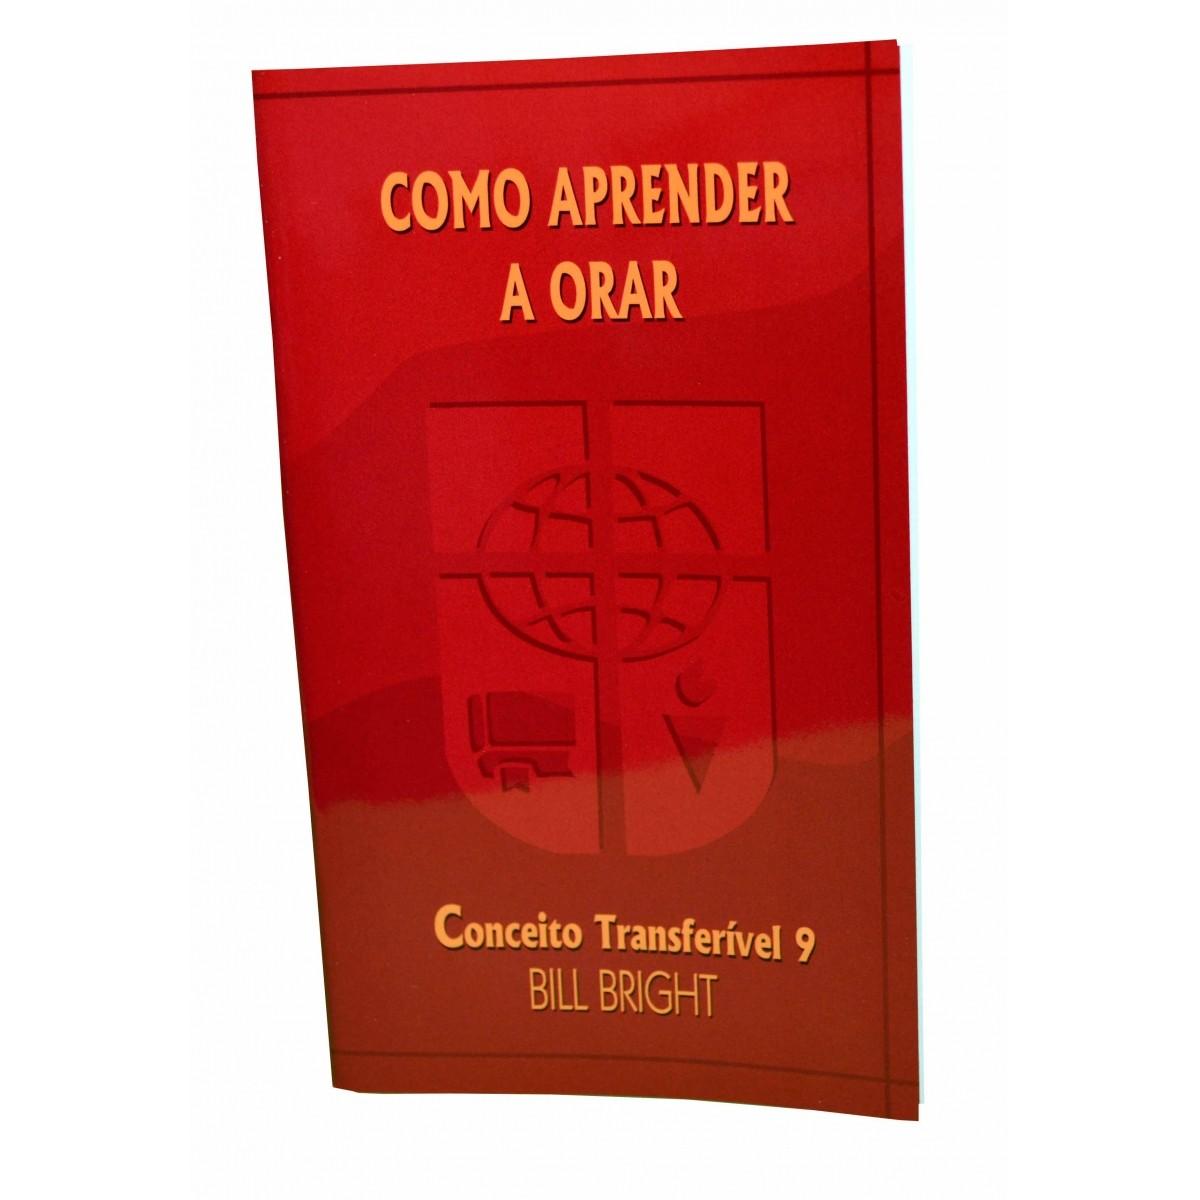 Conceito Transferível 9 - Como aprender a Orar